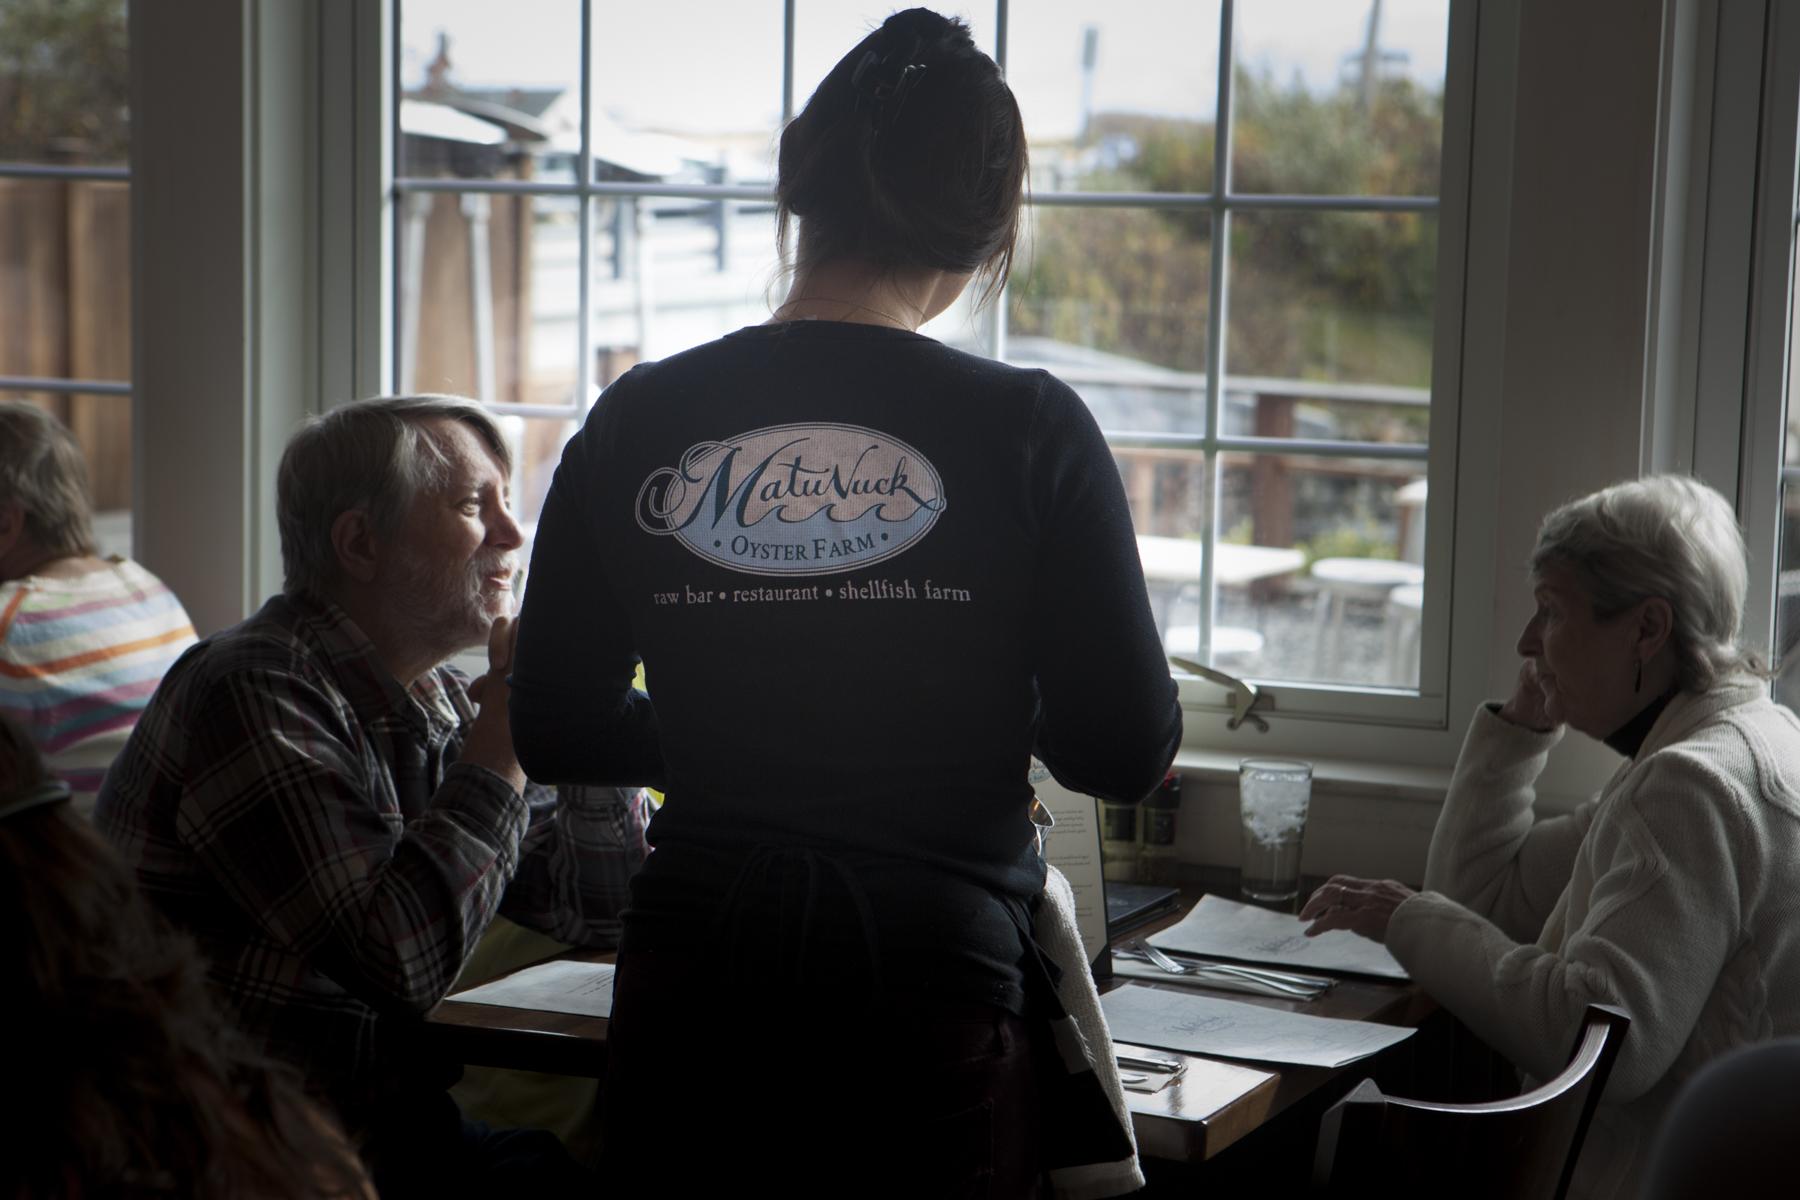 Waitress & Customers